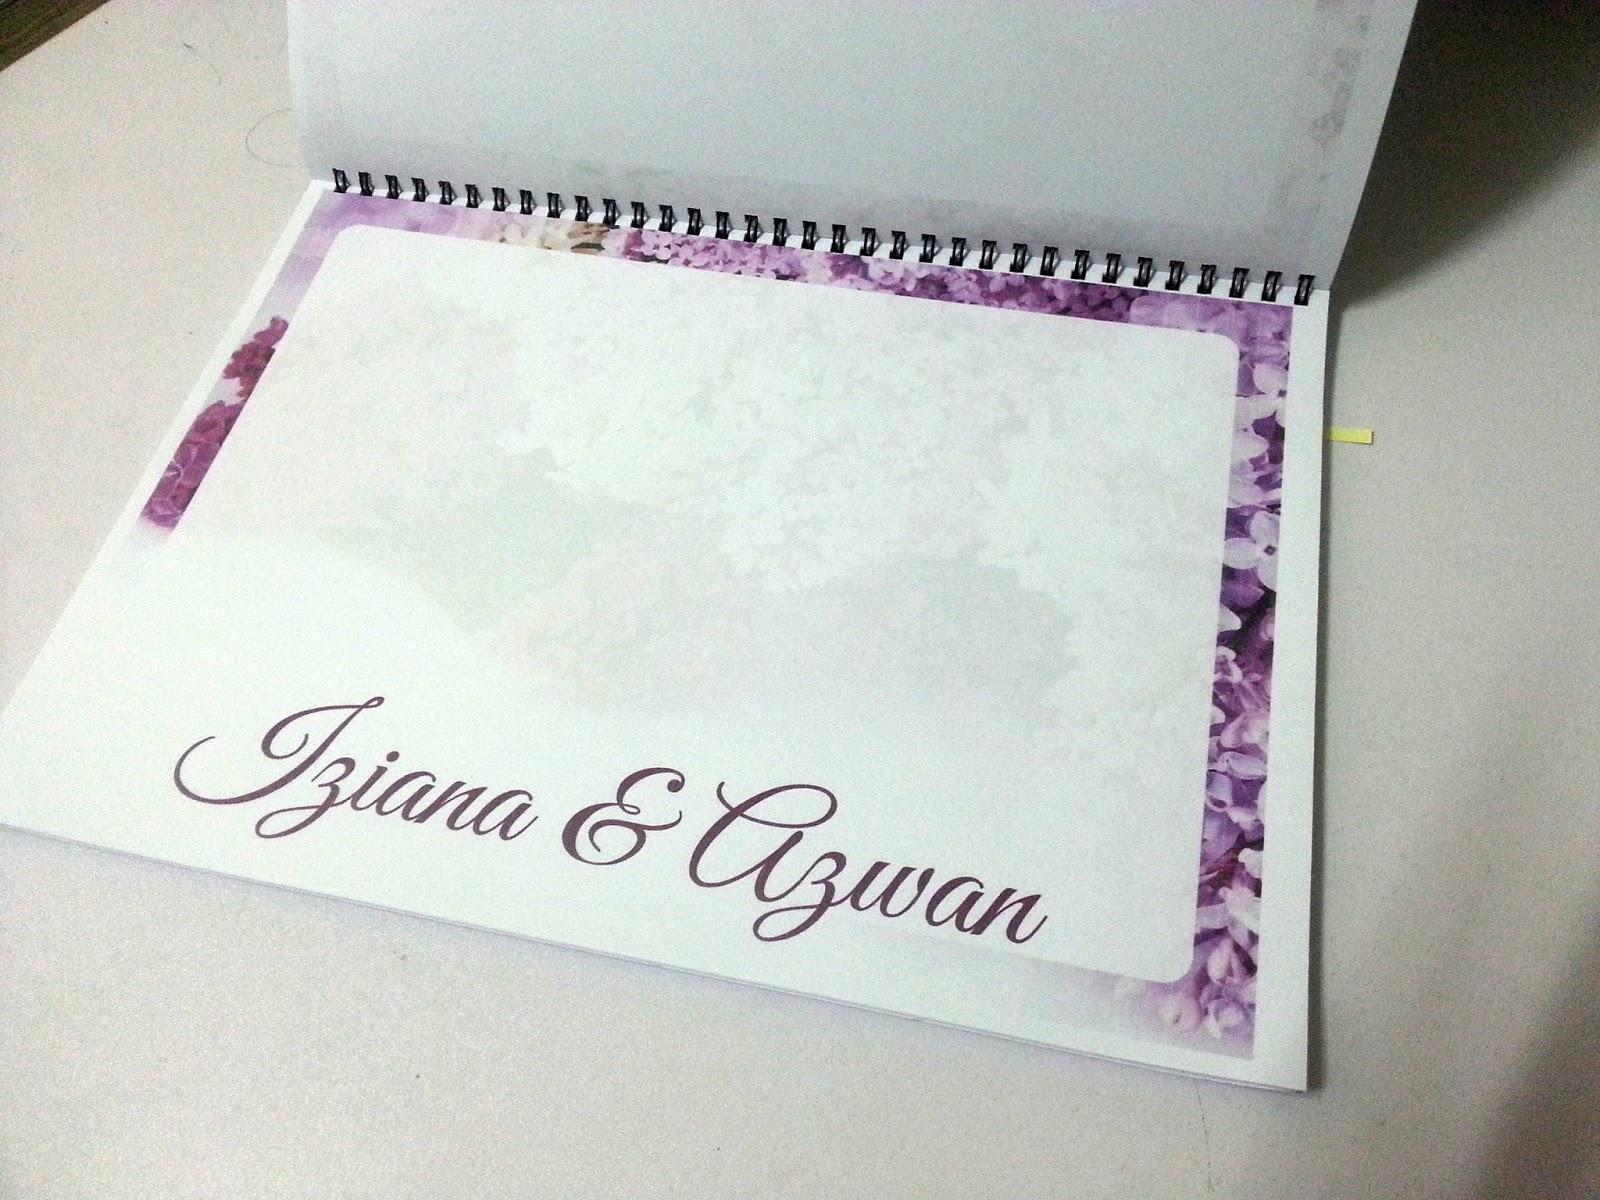 Wedding Guest Book Cover Diy ~ Tentang hidup one stop centre persediaan majlis